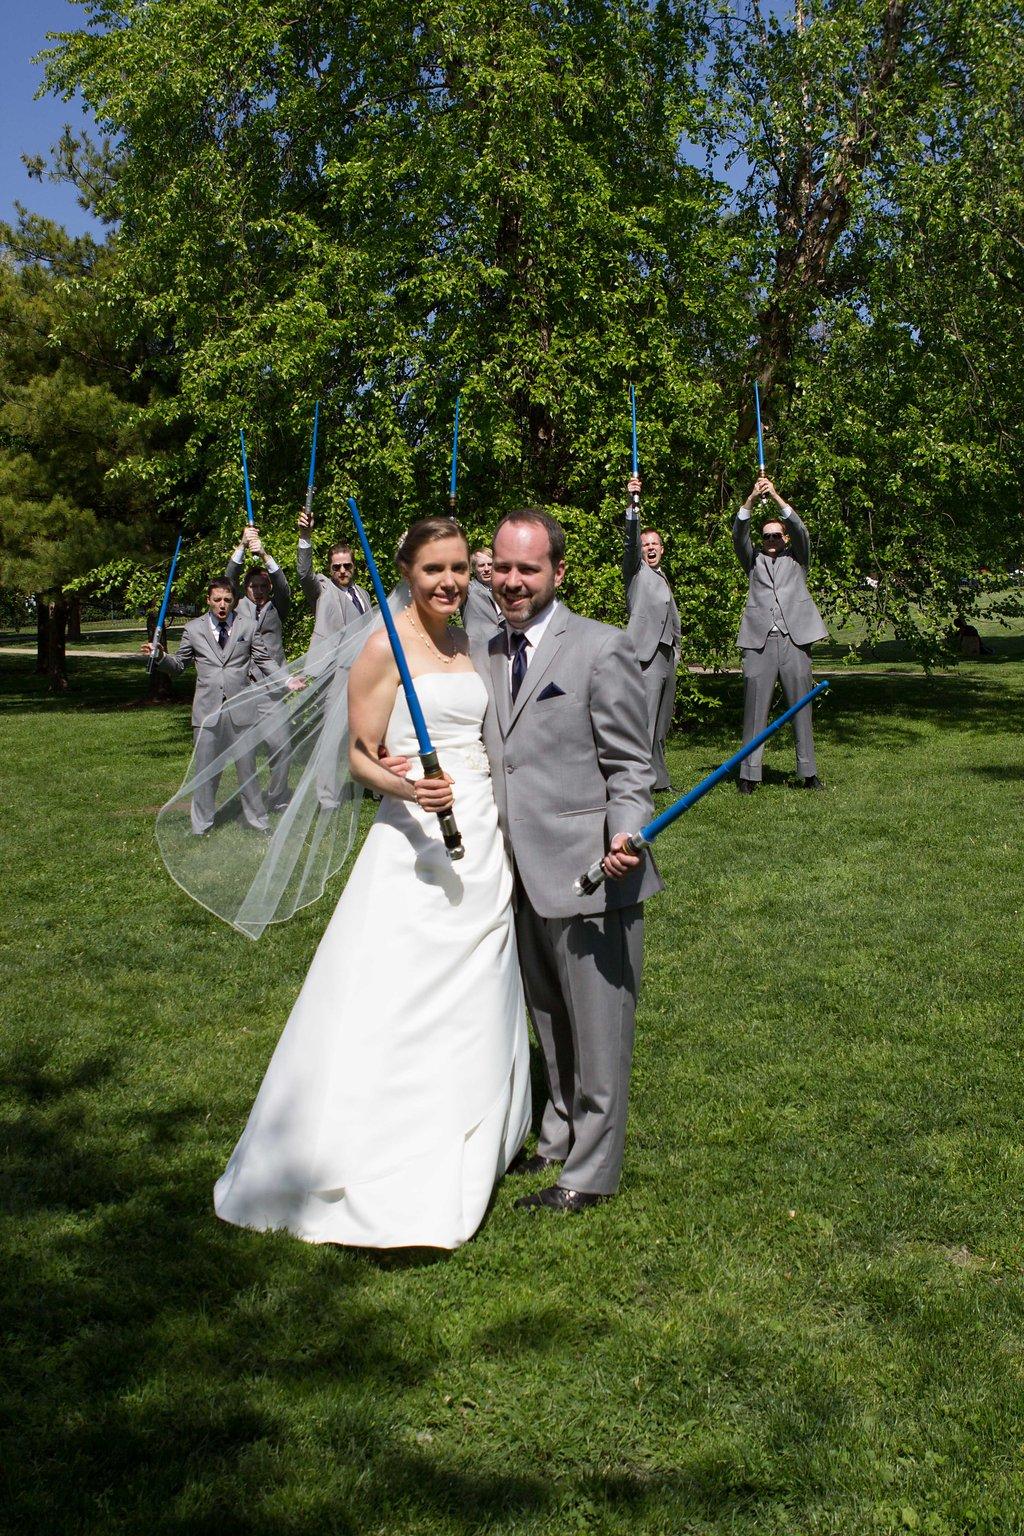 jakeandsuze_weddingselects-48.jpg